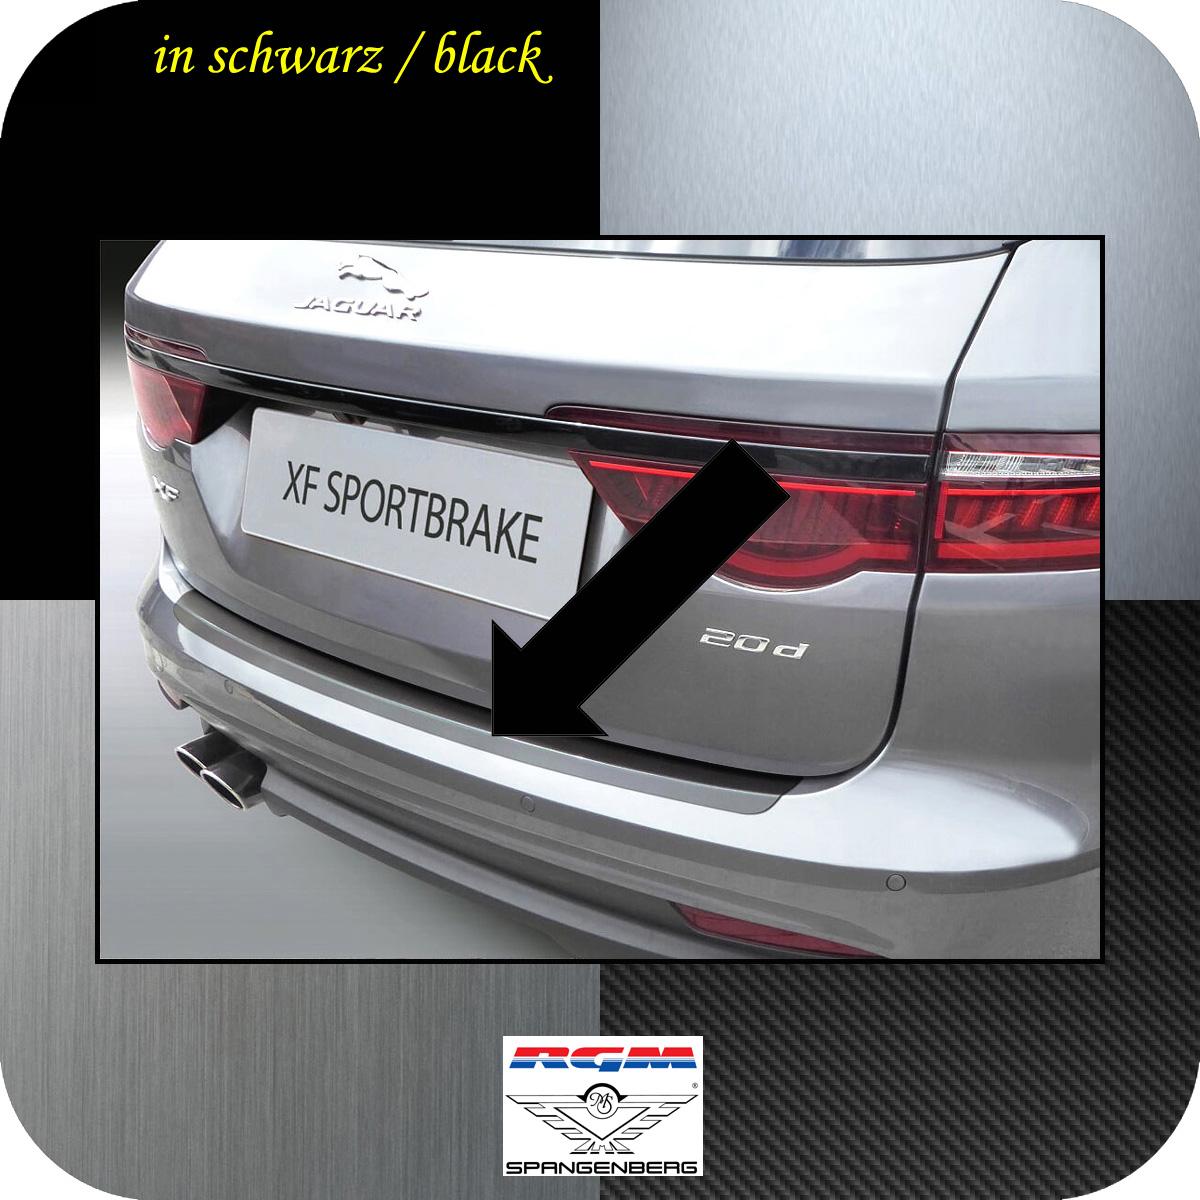 Ladekantenschutz schwarz Jaguar XF Sportbrake Kombi MK2 ab Bj. 07.2017- 3500635